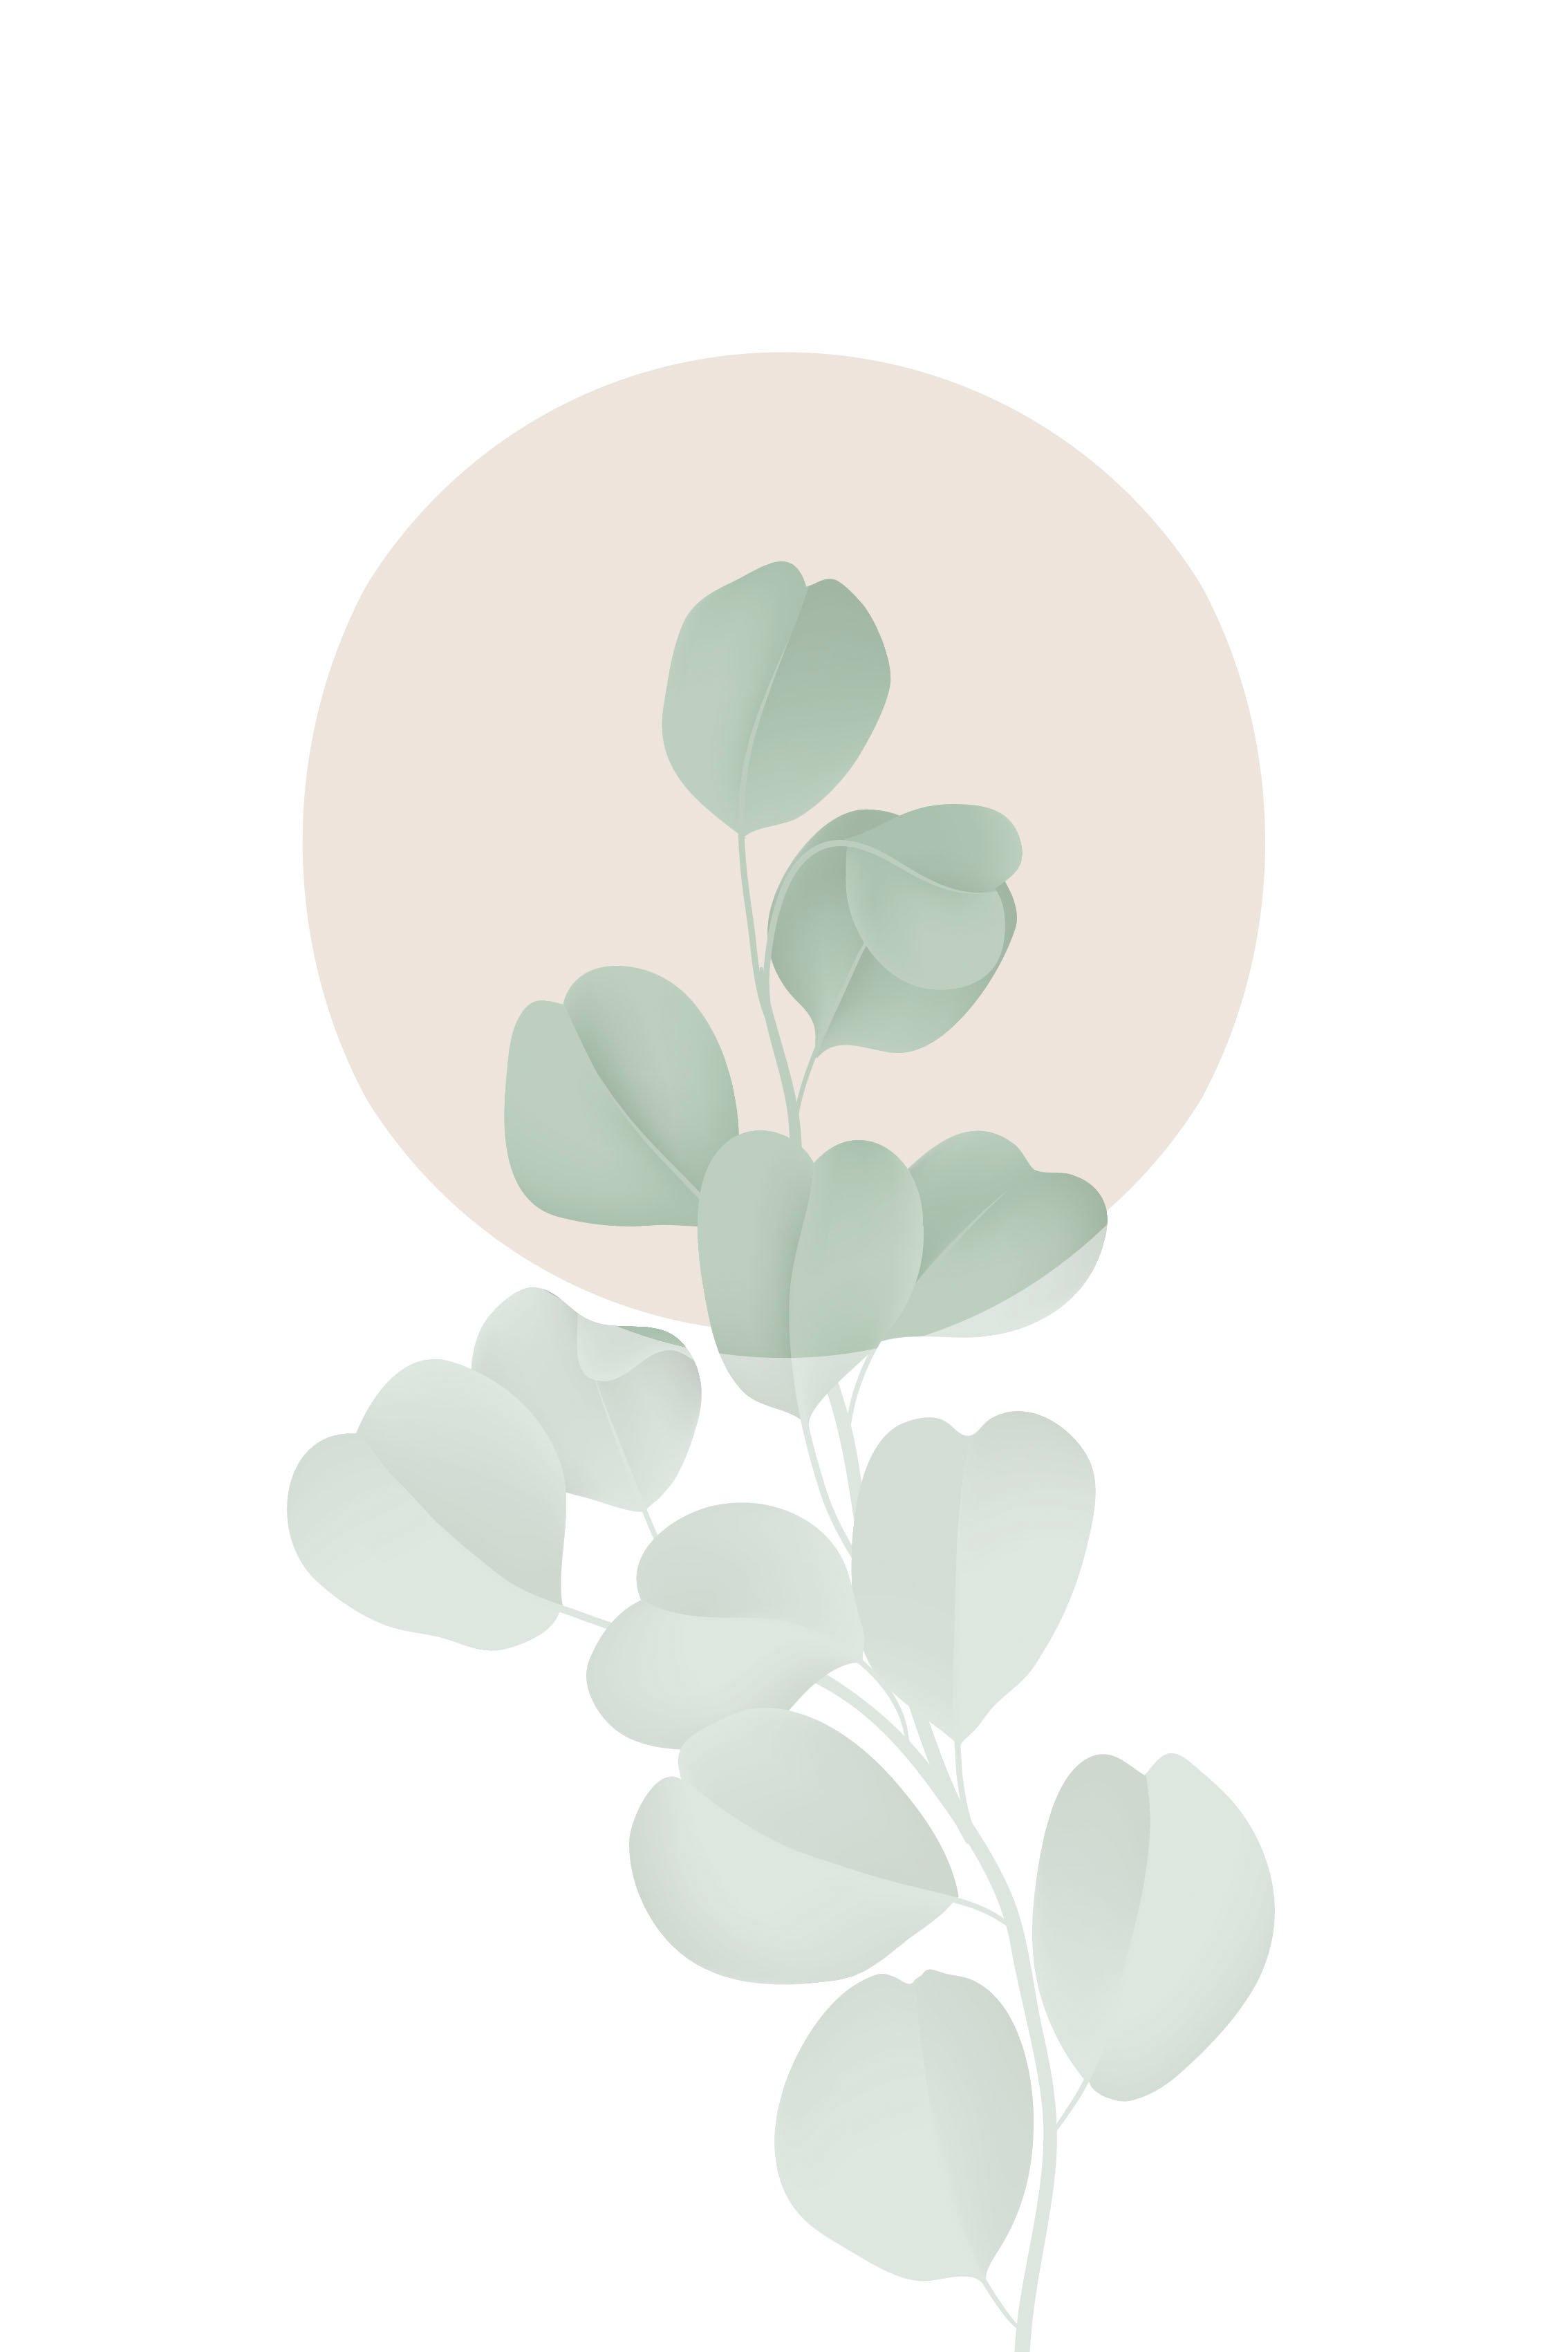 queence artprint op linnen Blaadjes roze cirkel online kopen op otto.nl